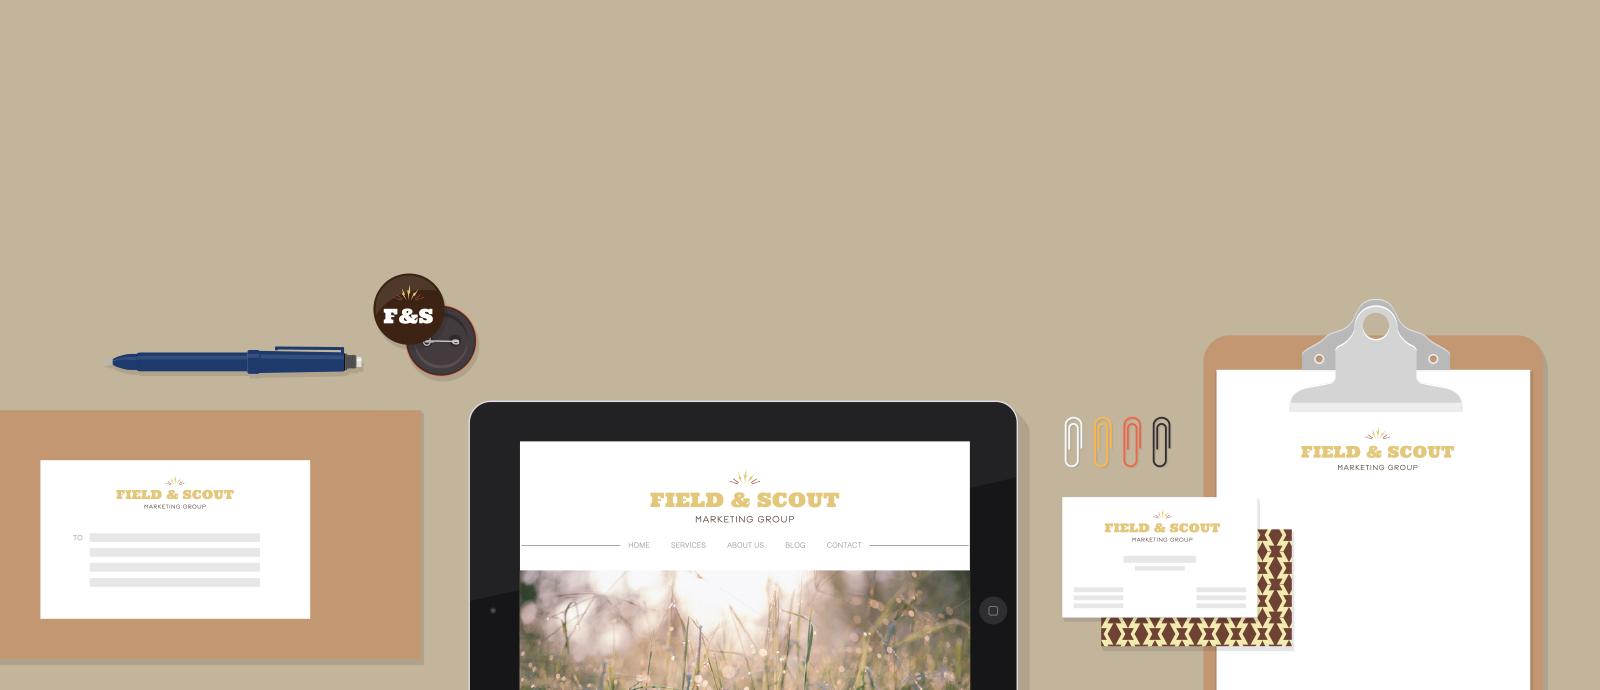 Online Logo Generator and Creator- Brand, Website, Business Card ...